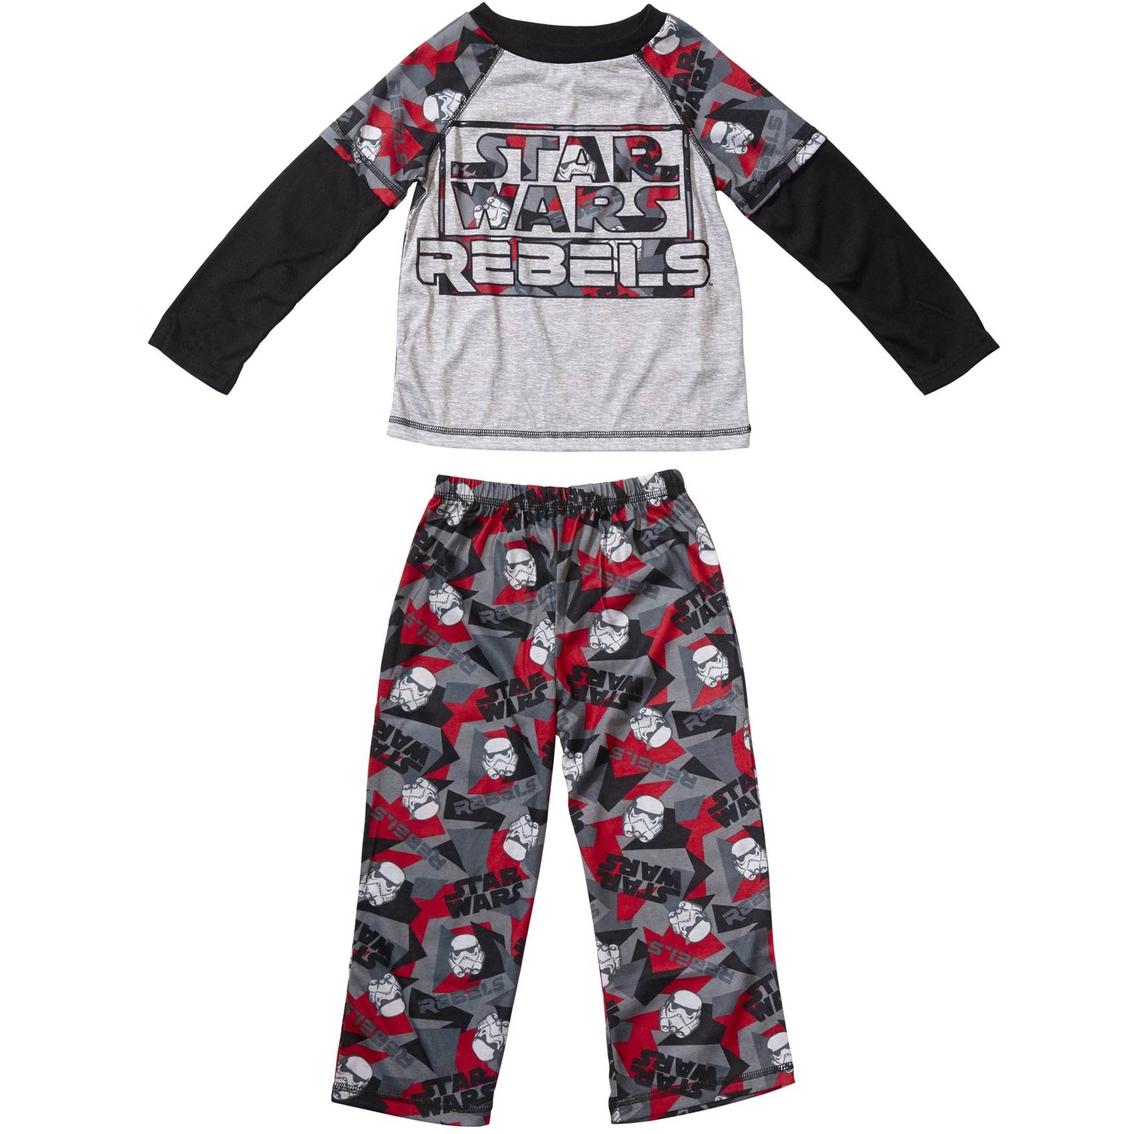 Disney Boys Star Wars Darth Vader Pajama Sleep Gift Set, Red & Black. Sold by Tropical Essence. $ Disney Boys Star Wars